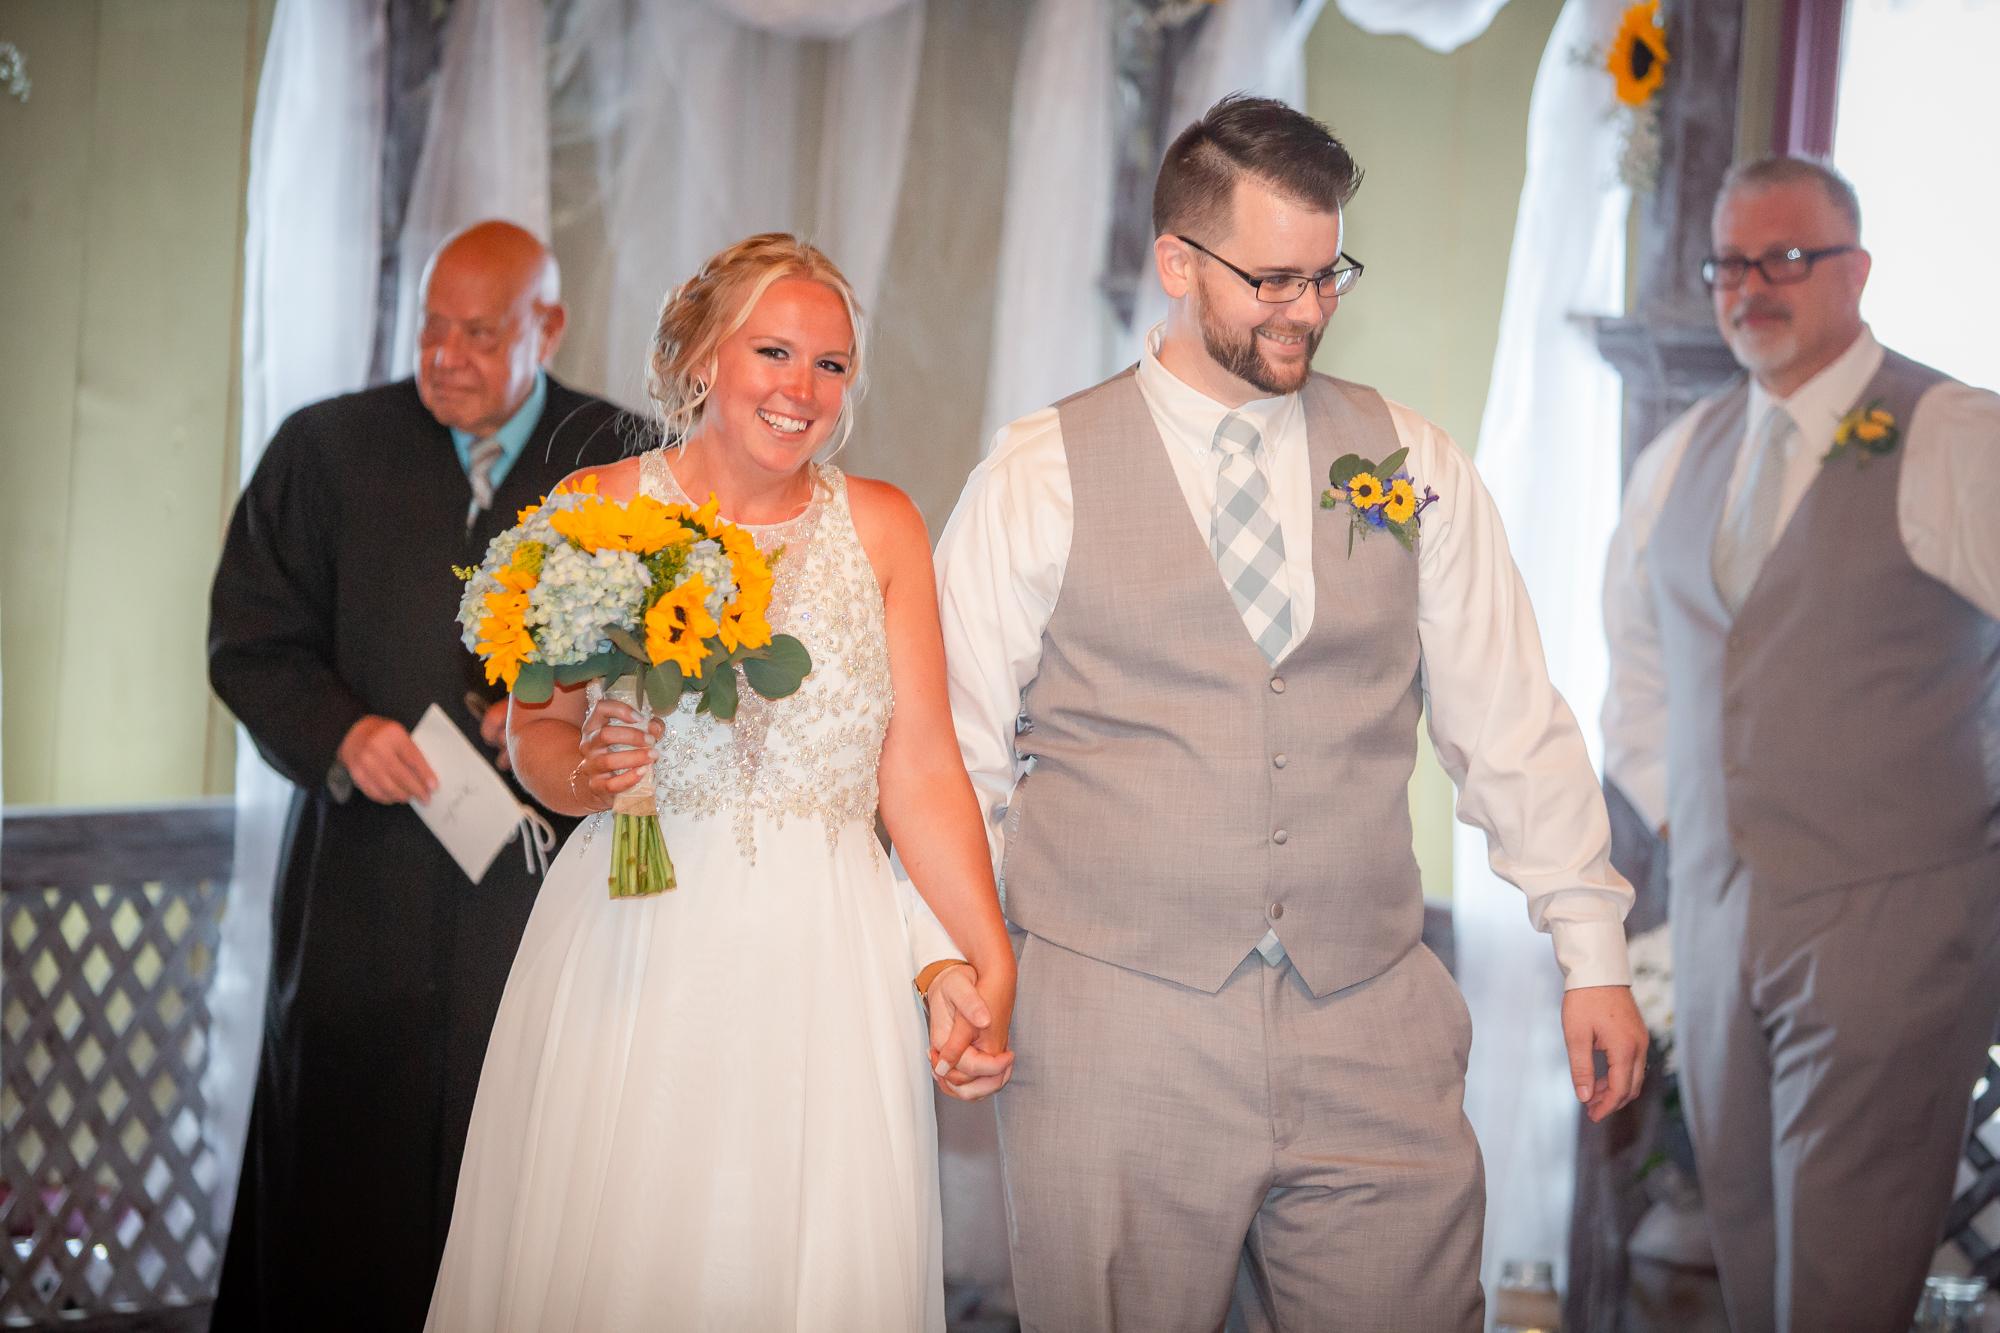 Wedding-Carriage-House-Oneonta-NY-0568.jpg